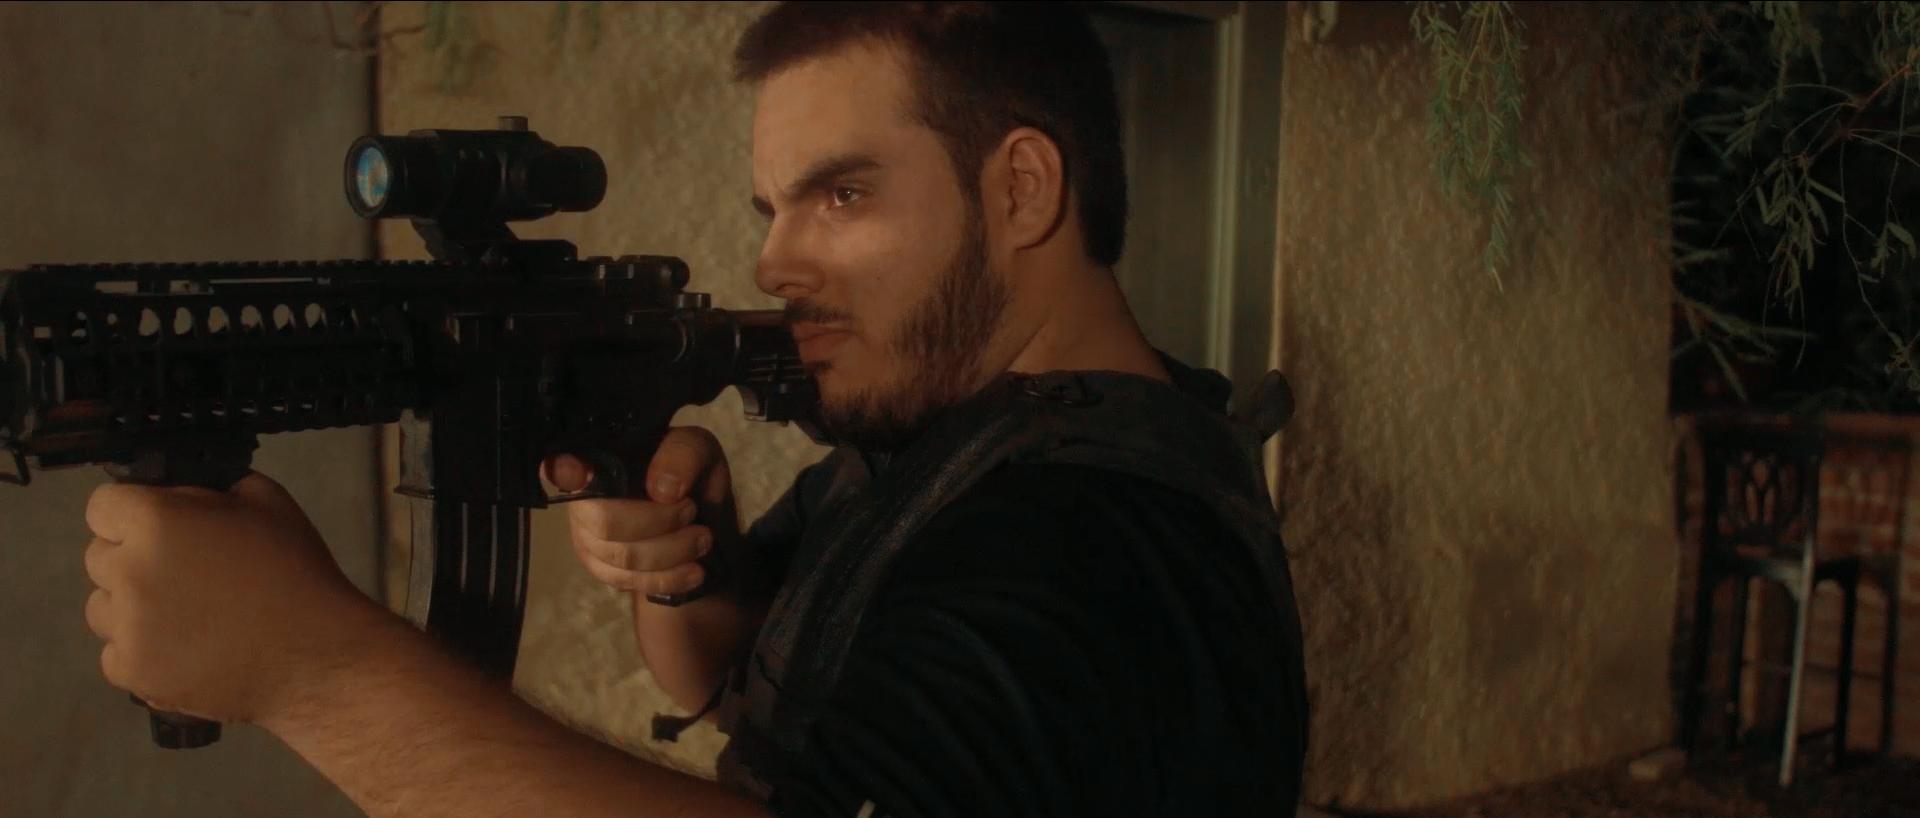 Alex Martinez in Garcia 2: The Rebirth (2020)